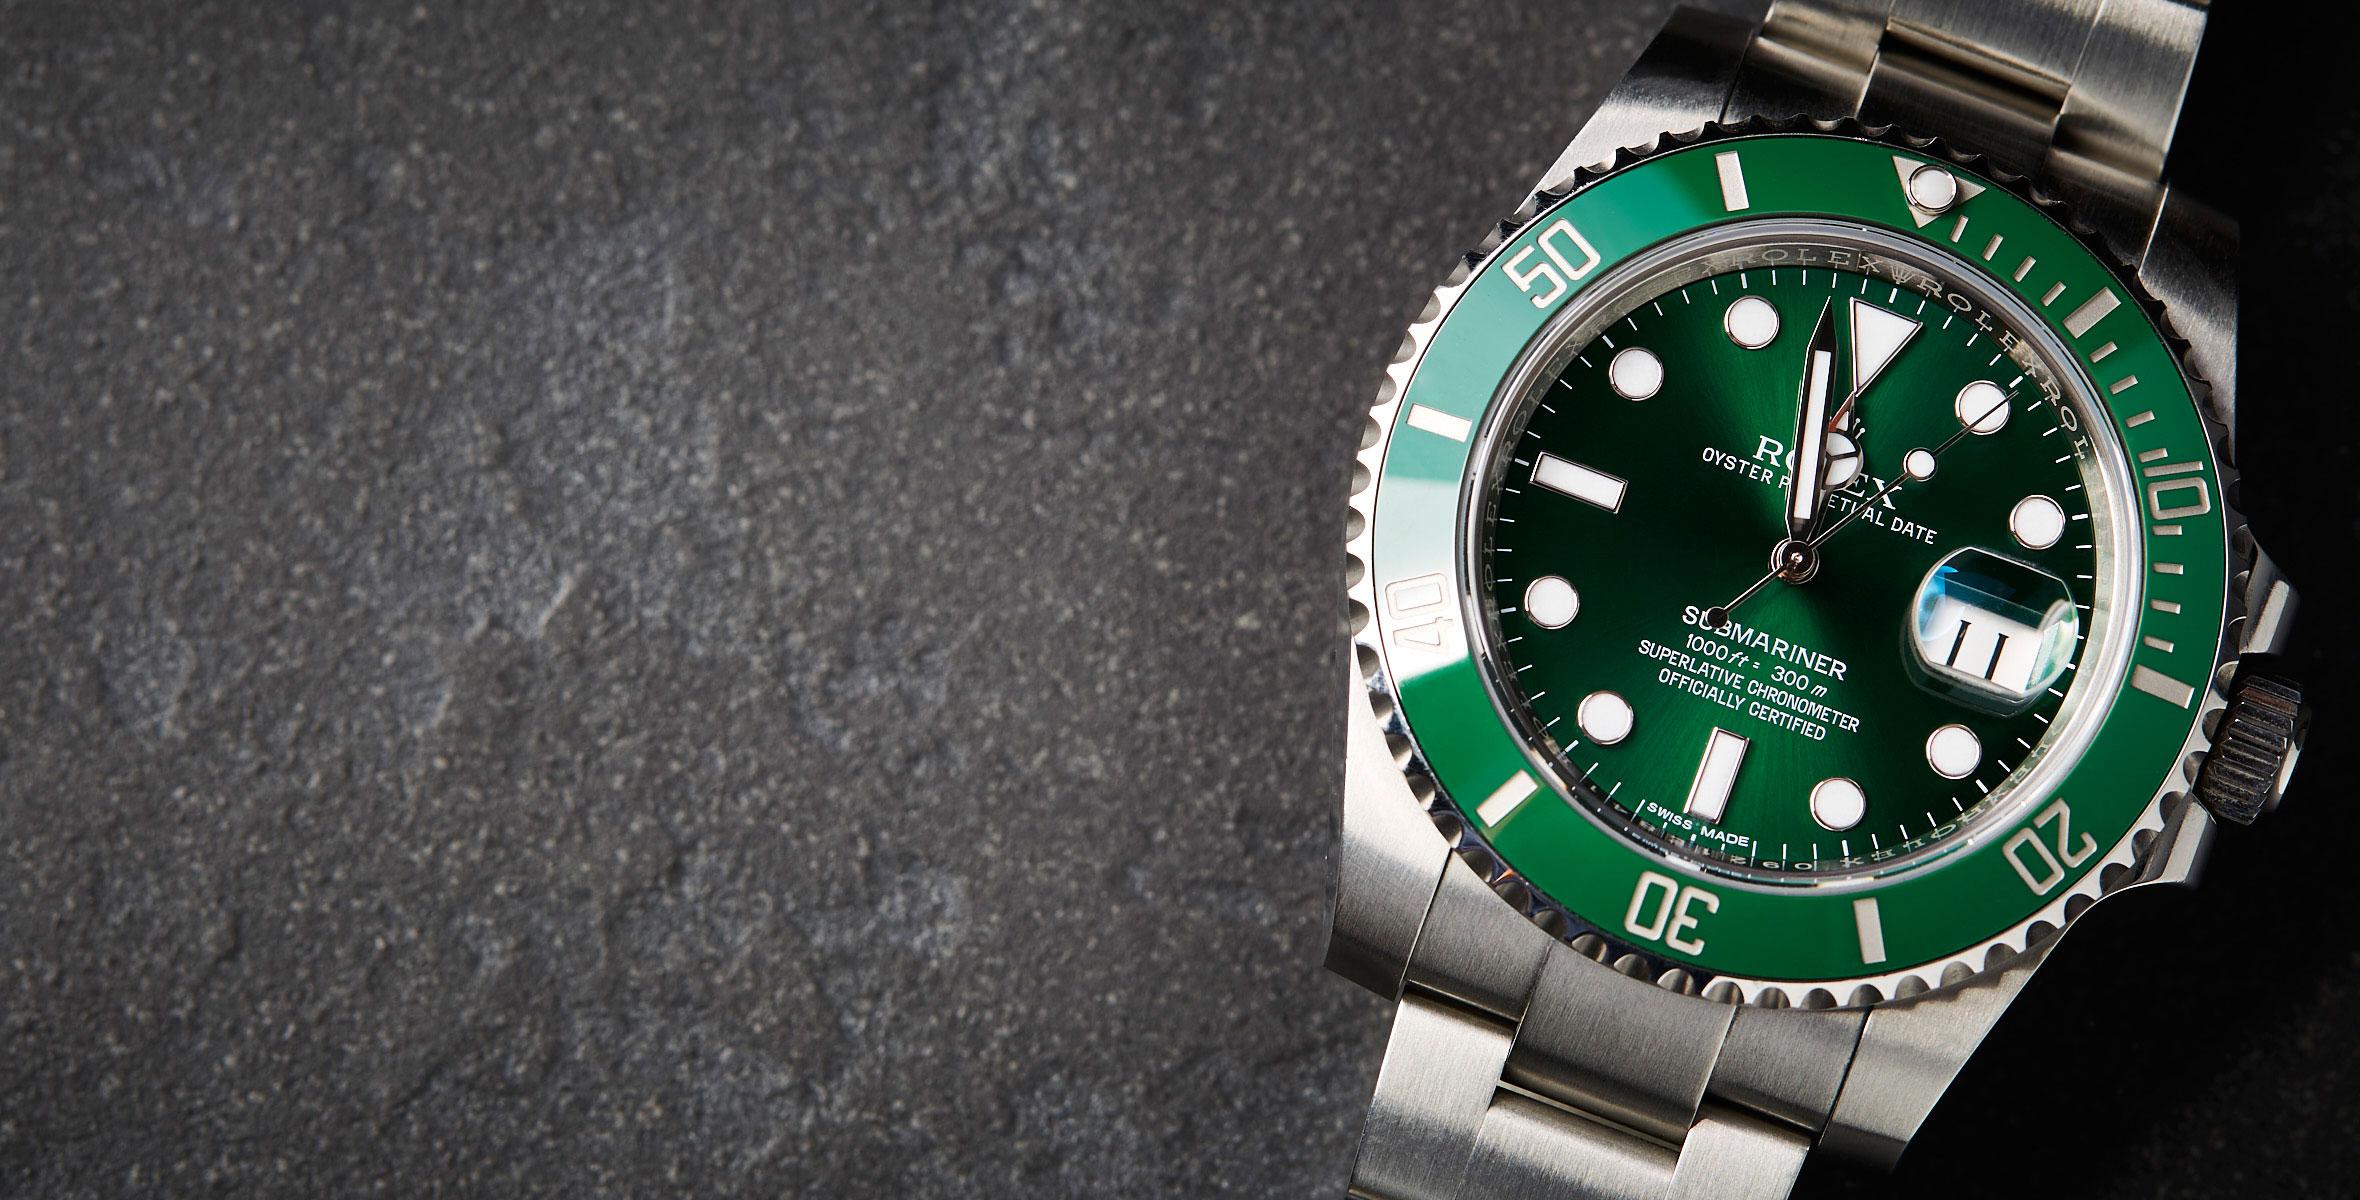 3952a195ea0 Rolex Submariner 116610LV – AKA  The Hulk  – Year-long Review